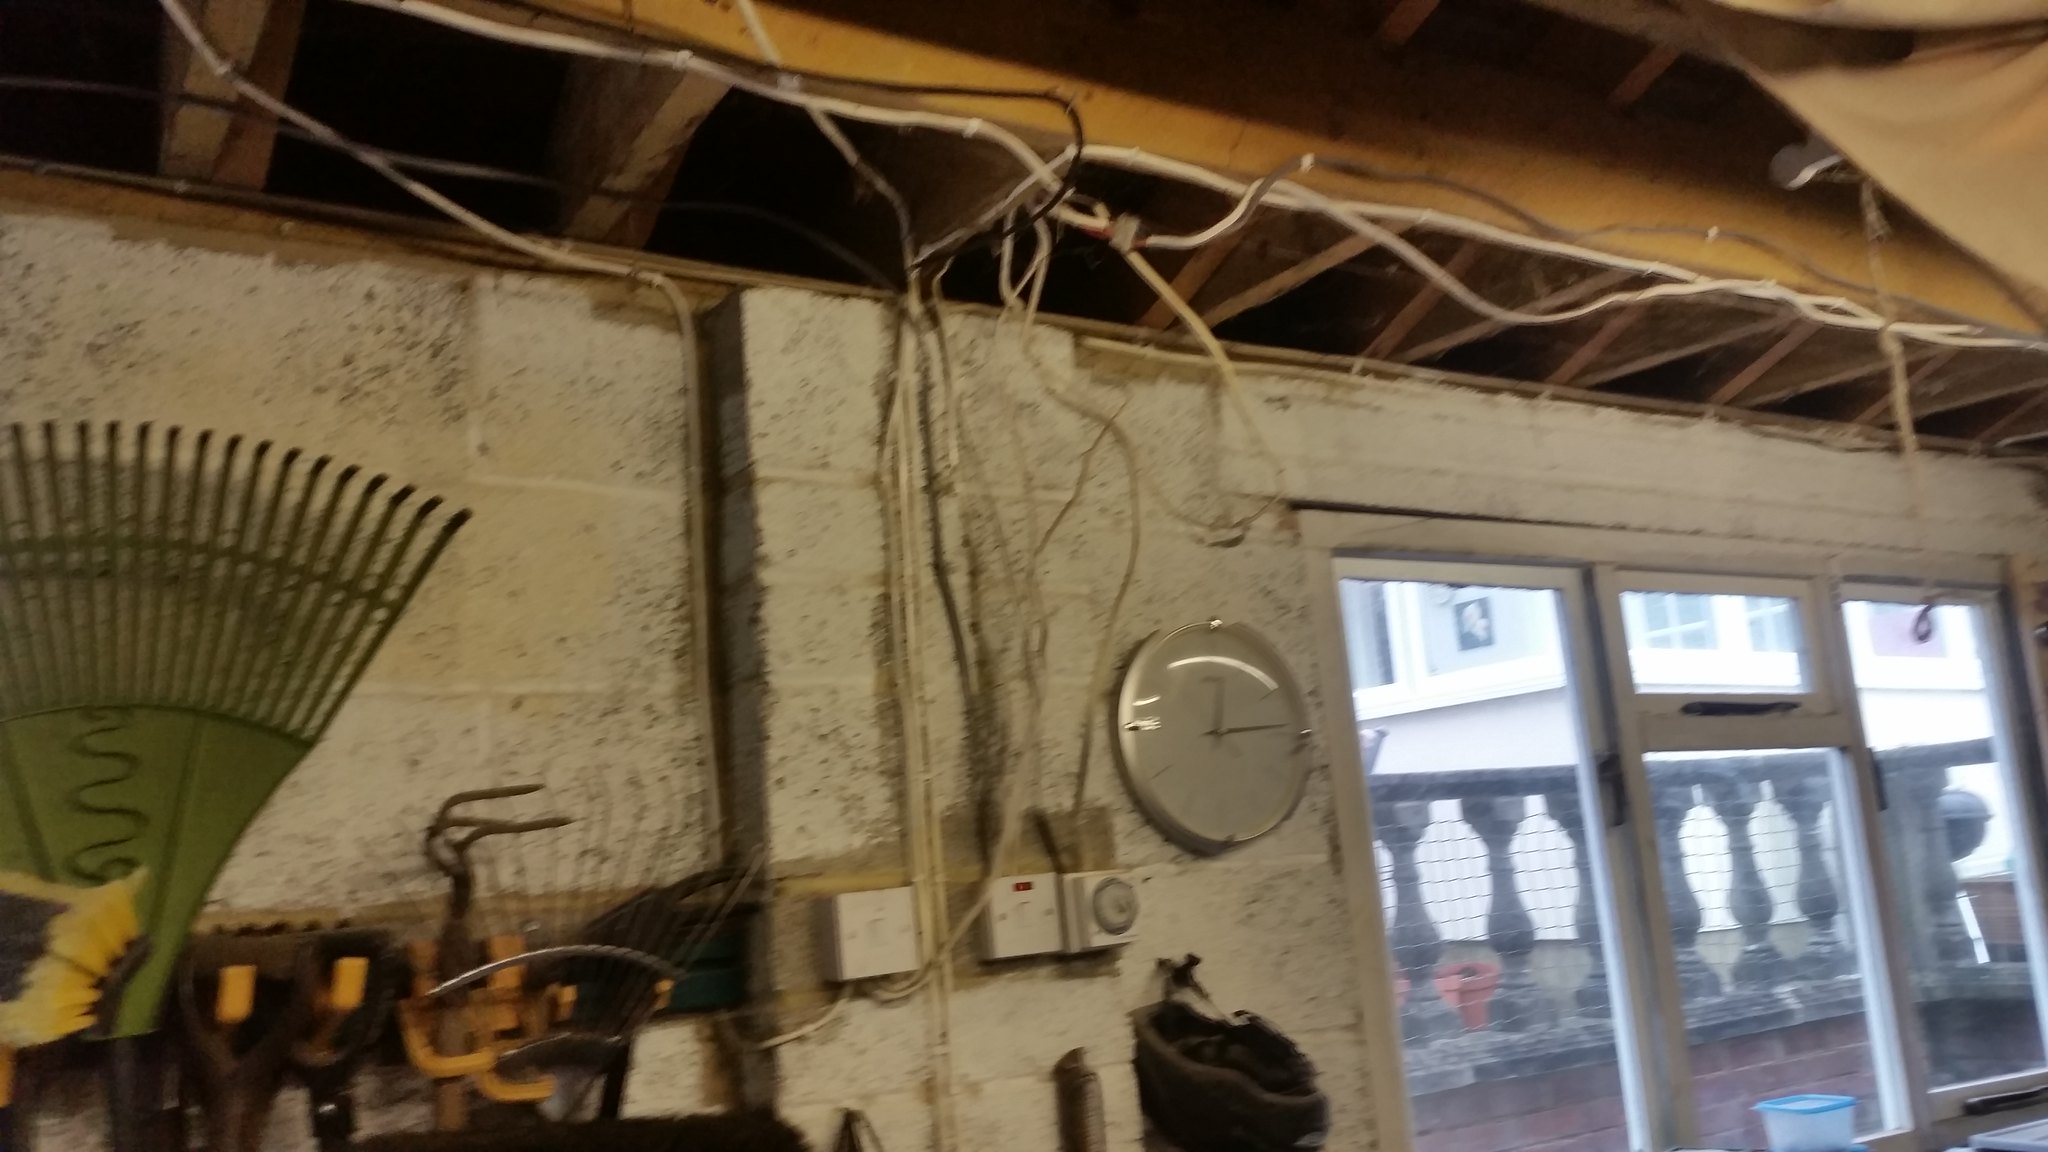 Rewiring The Garage Electricians To Forum Please Singletrack An Old House Plaster Walls Urlhttps Flickr P Ekkzwu20160222 122025 Url By Wca On